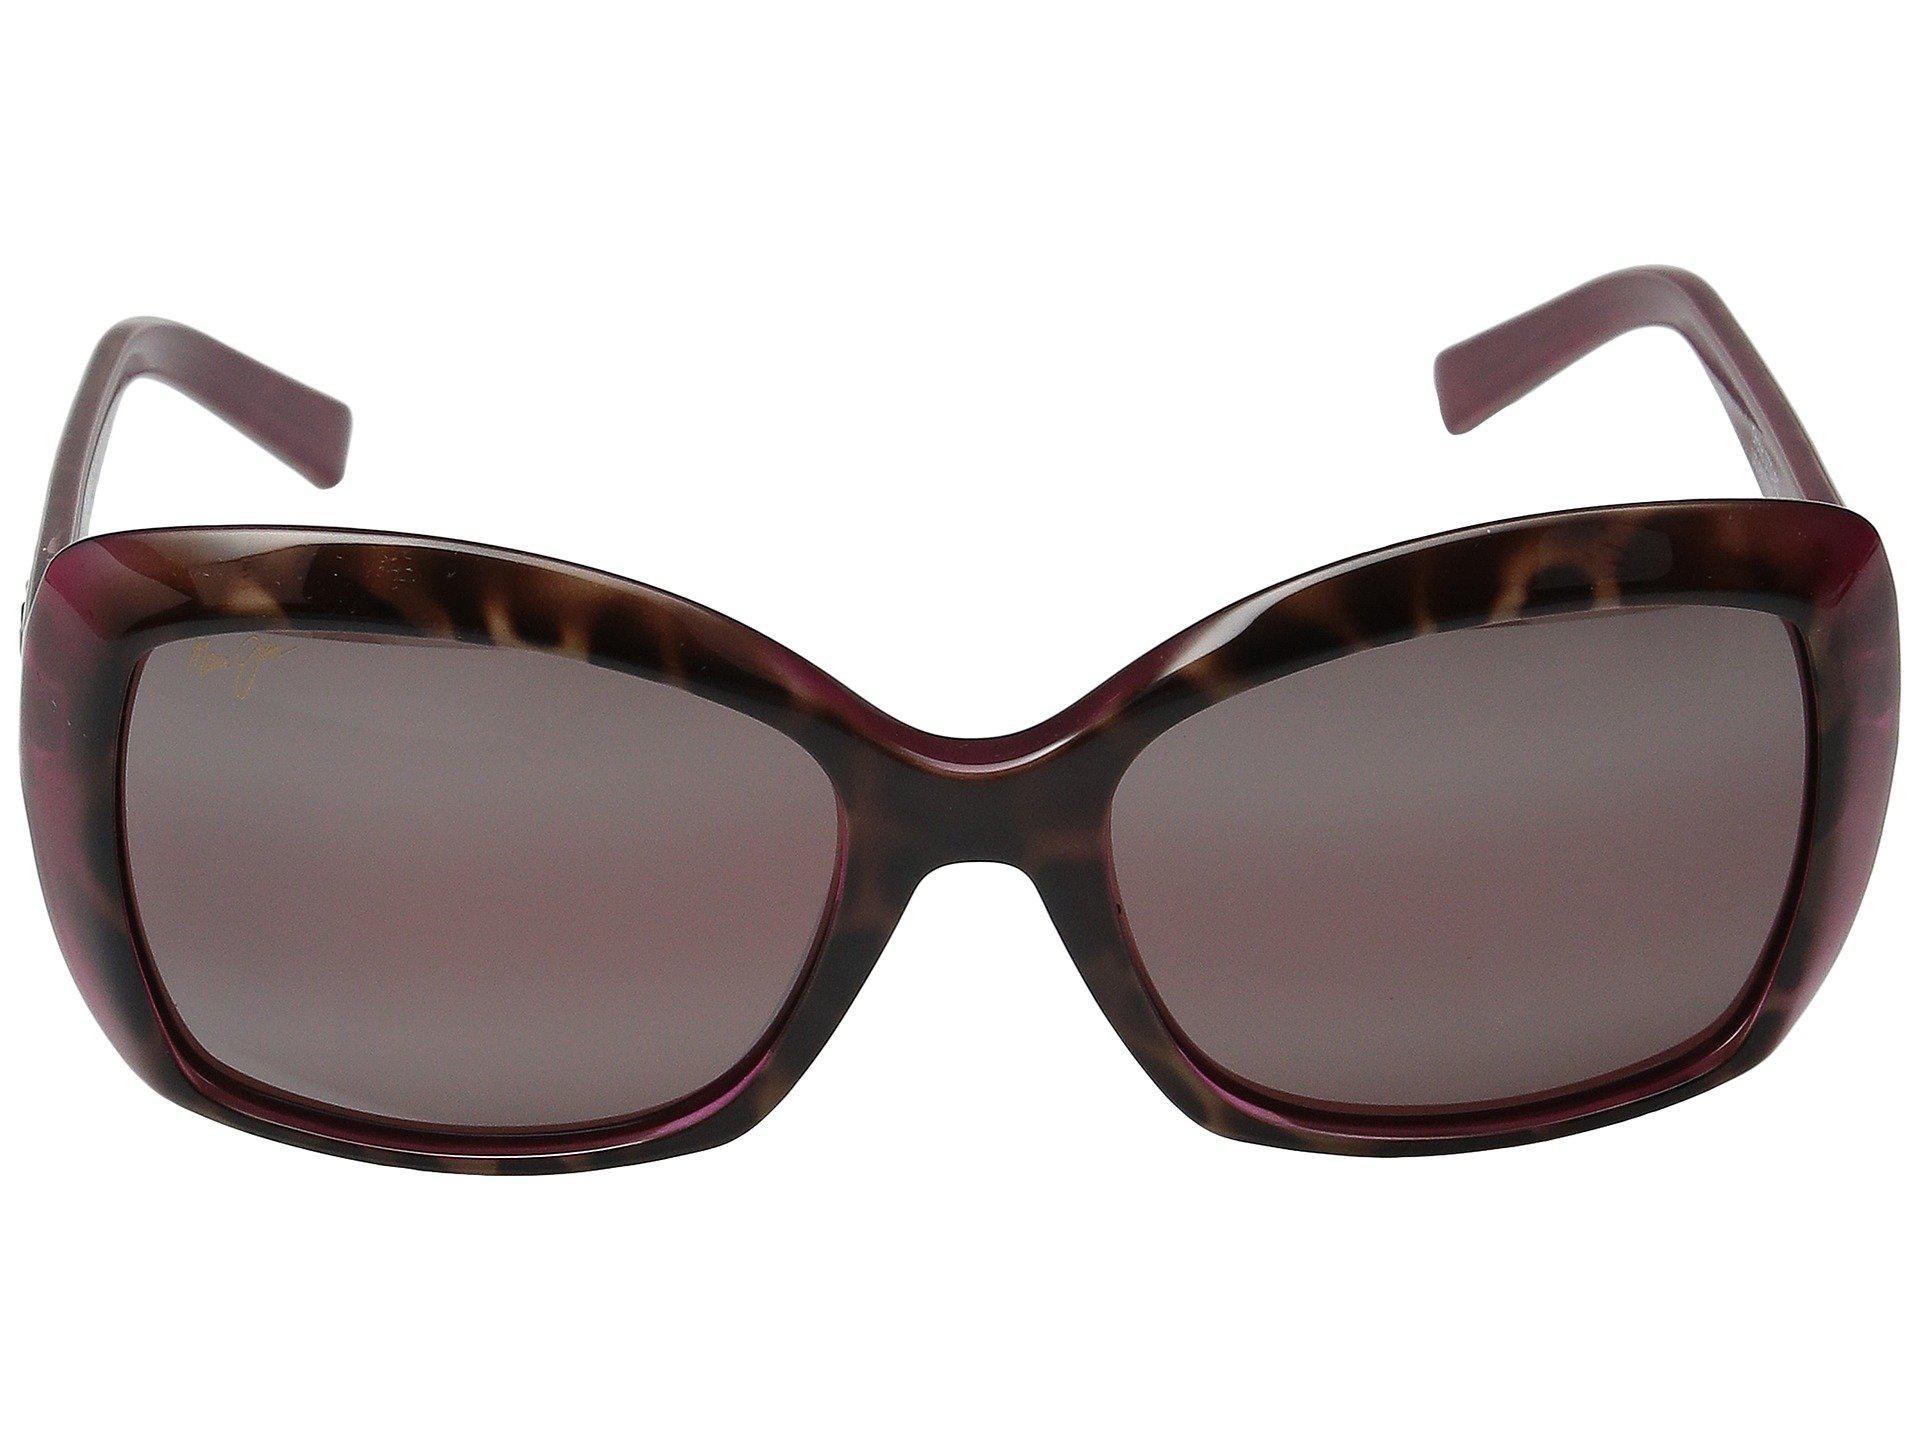 a8a0a74163d64 Maui Jim - Black Orchid (tortoise peacock hcl Bronze) Polarized Fashion  Sunglasses. View fullscreen